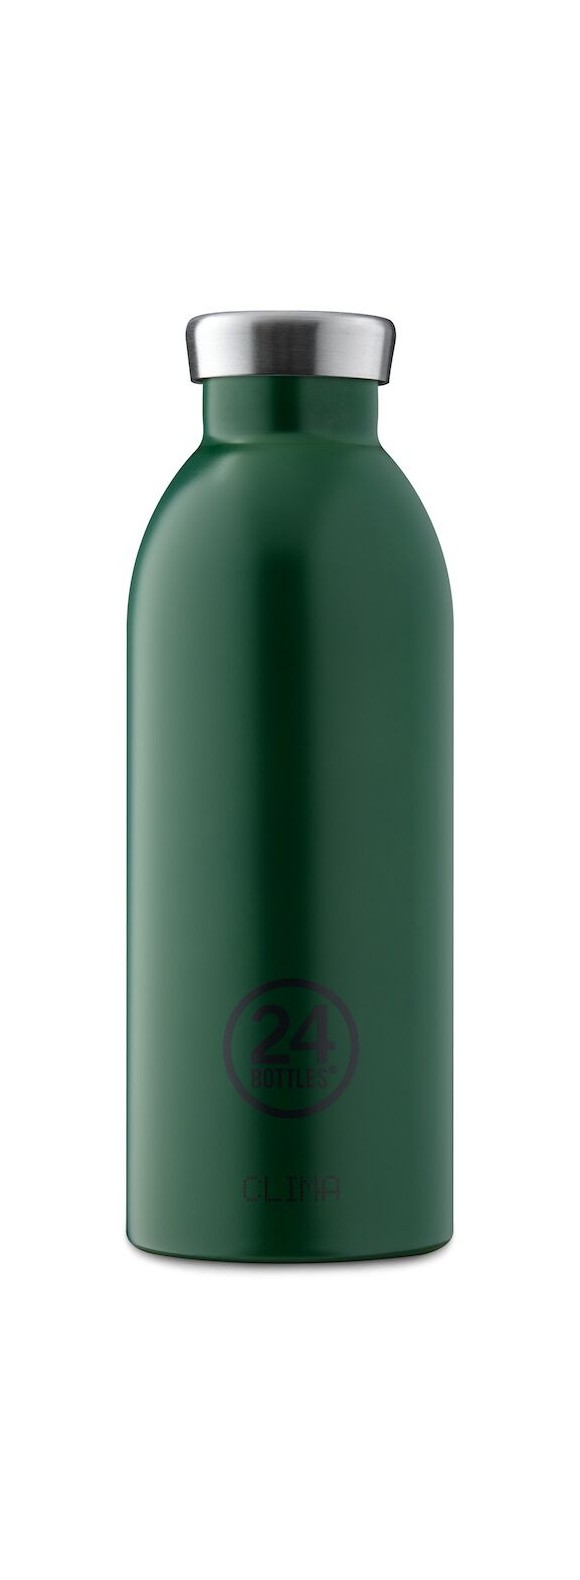 24 Bottles - Clima Bottle 0,5 L - Jungle Green (24B149)